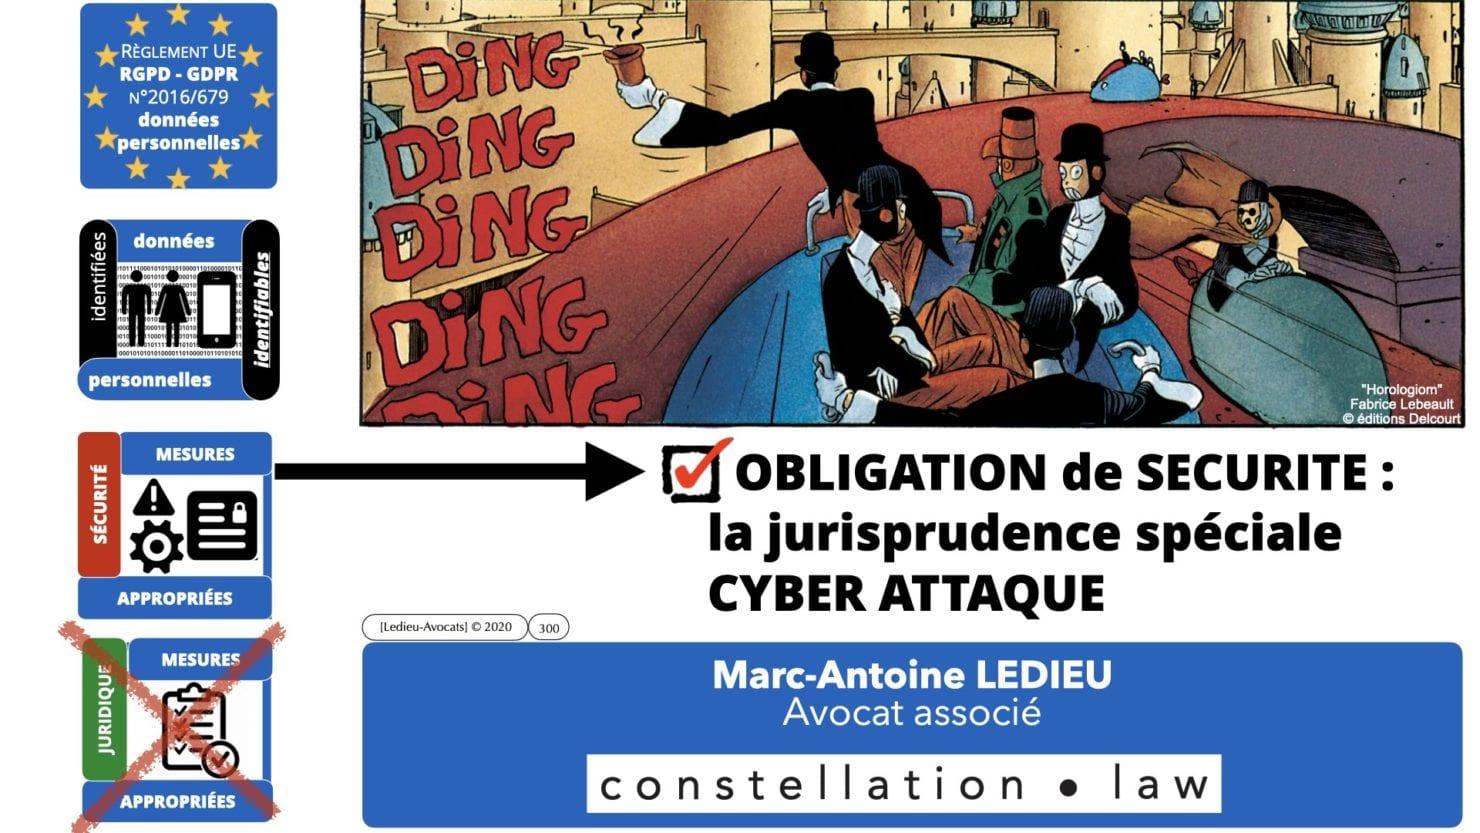 RGPD e-Privacy principes actualité jurisprudence ©Ledieu-Avocats 25-06-2021.300